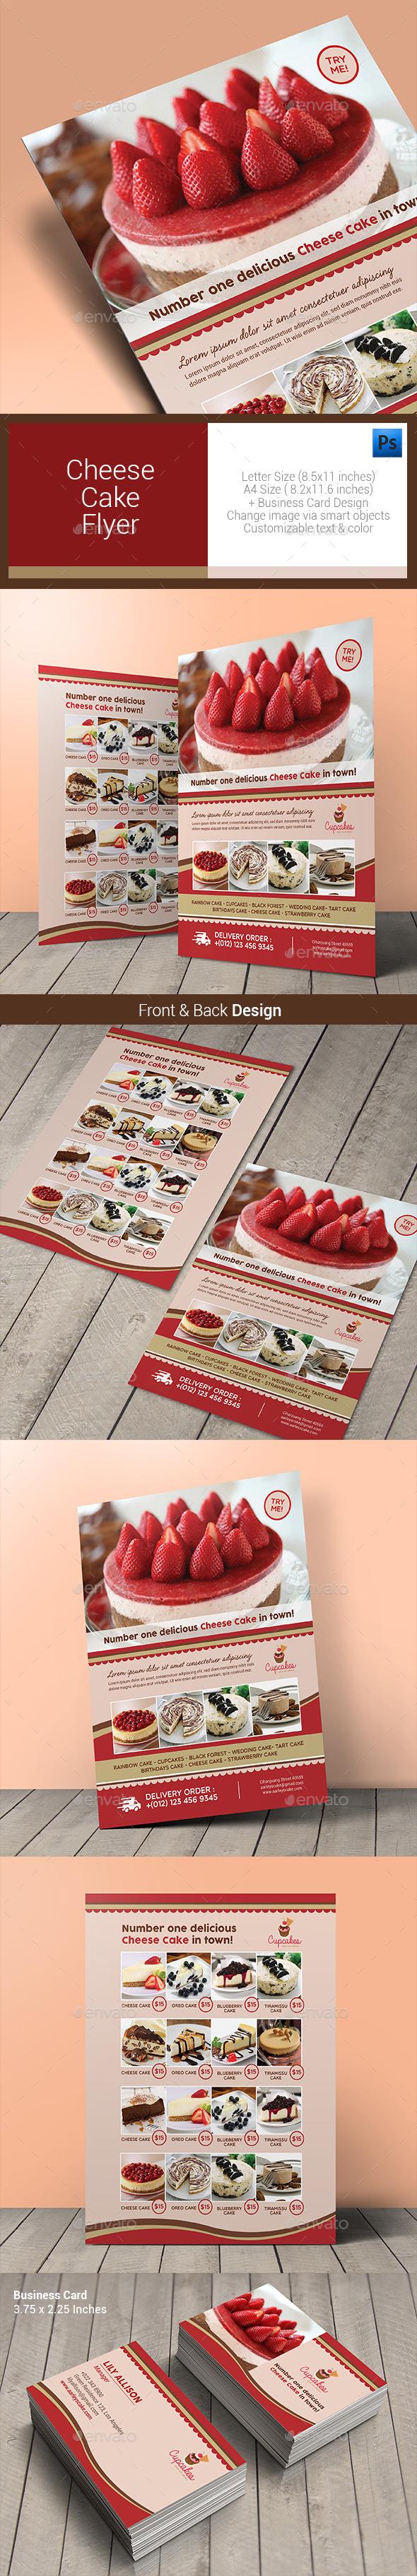 Cheese Cake Menu Flyer - Food Menus Print Templates